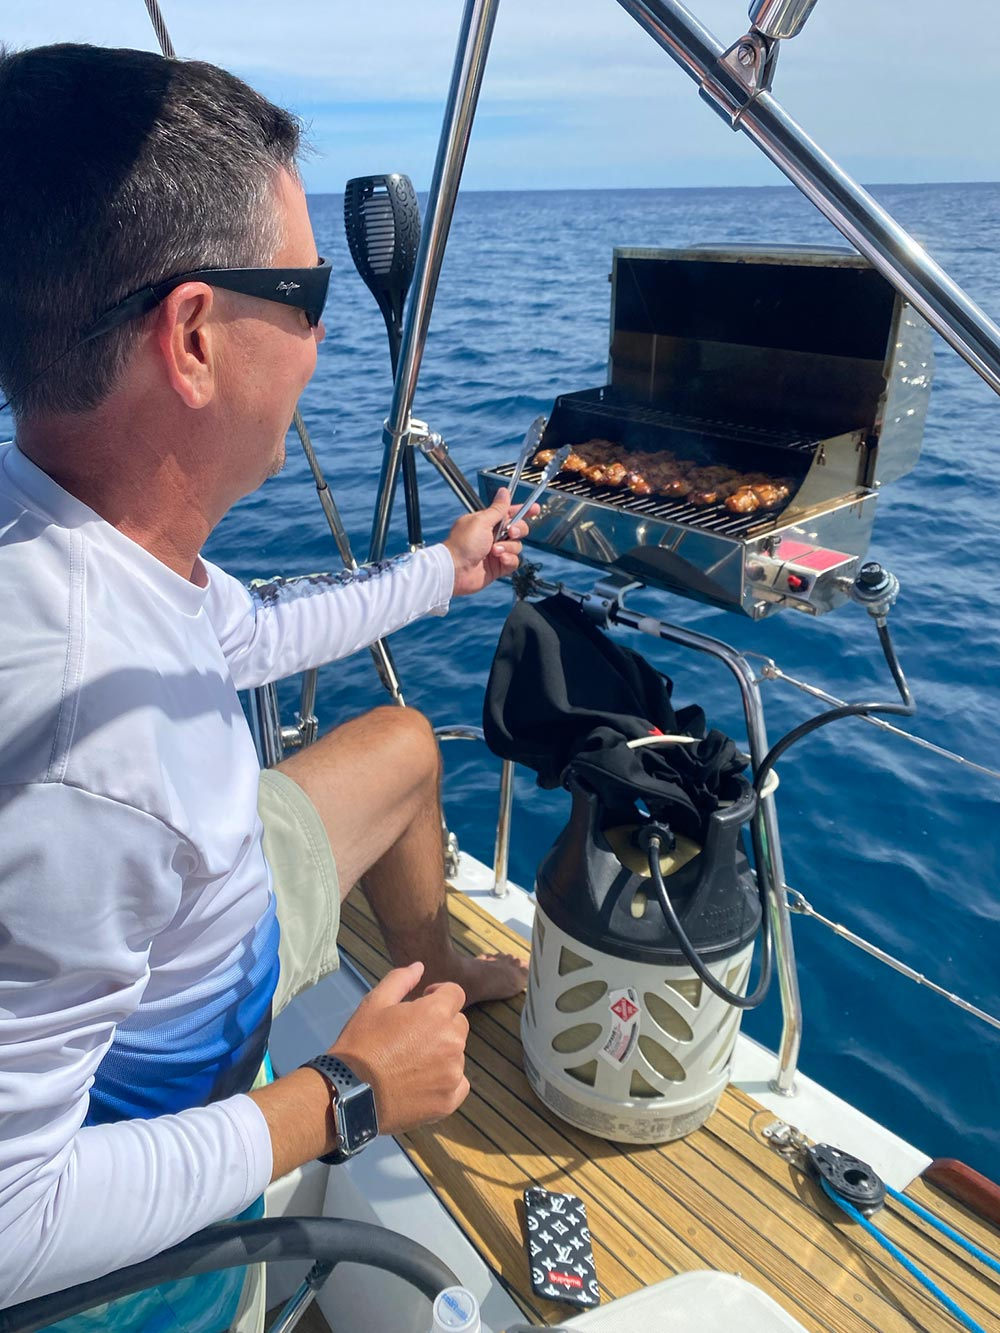 Man bbq on sailing yacht in Honolulu